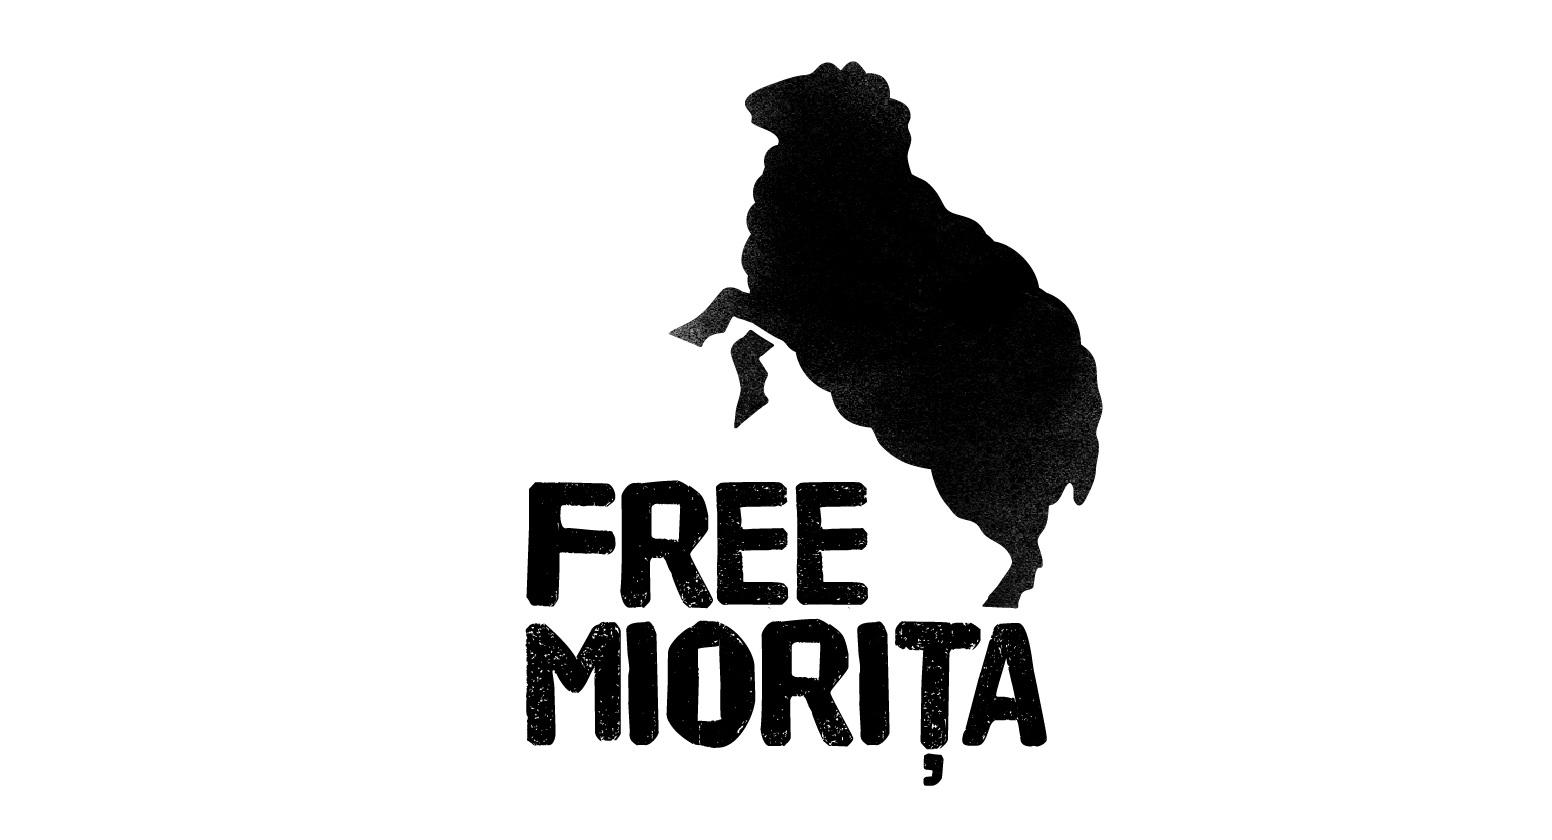 Free Mioriţa